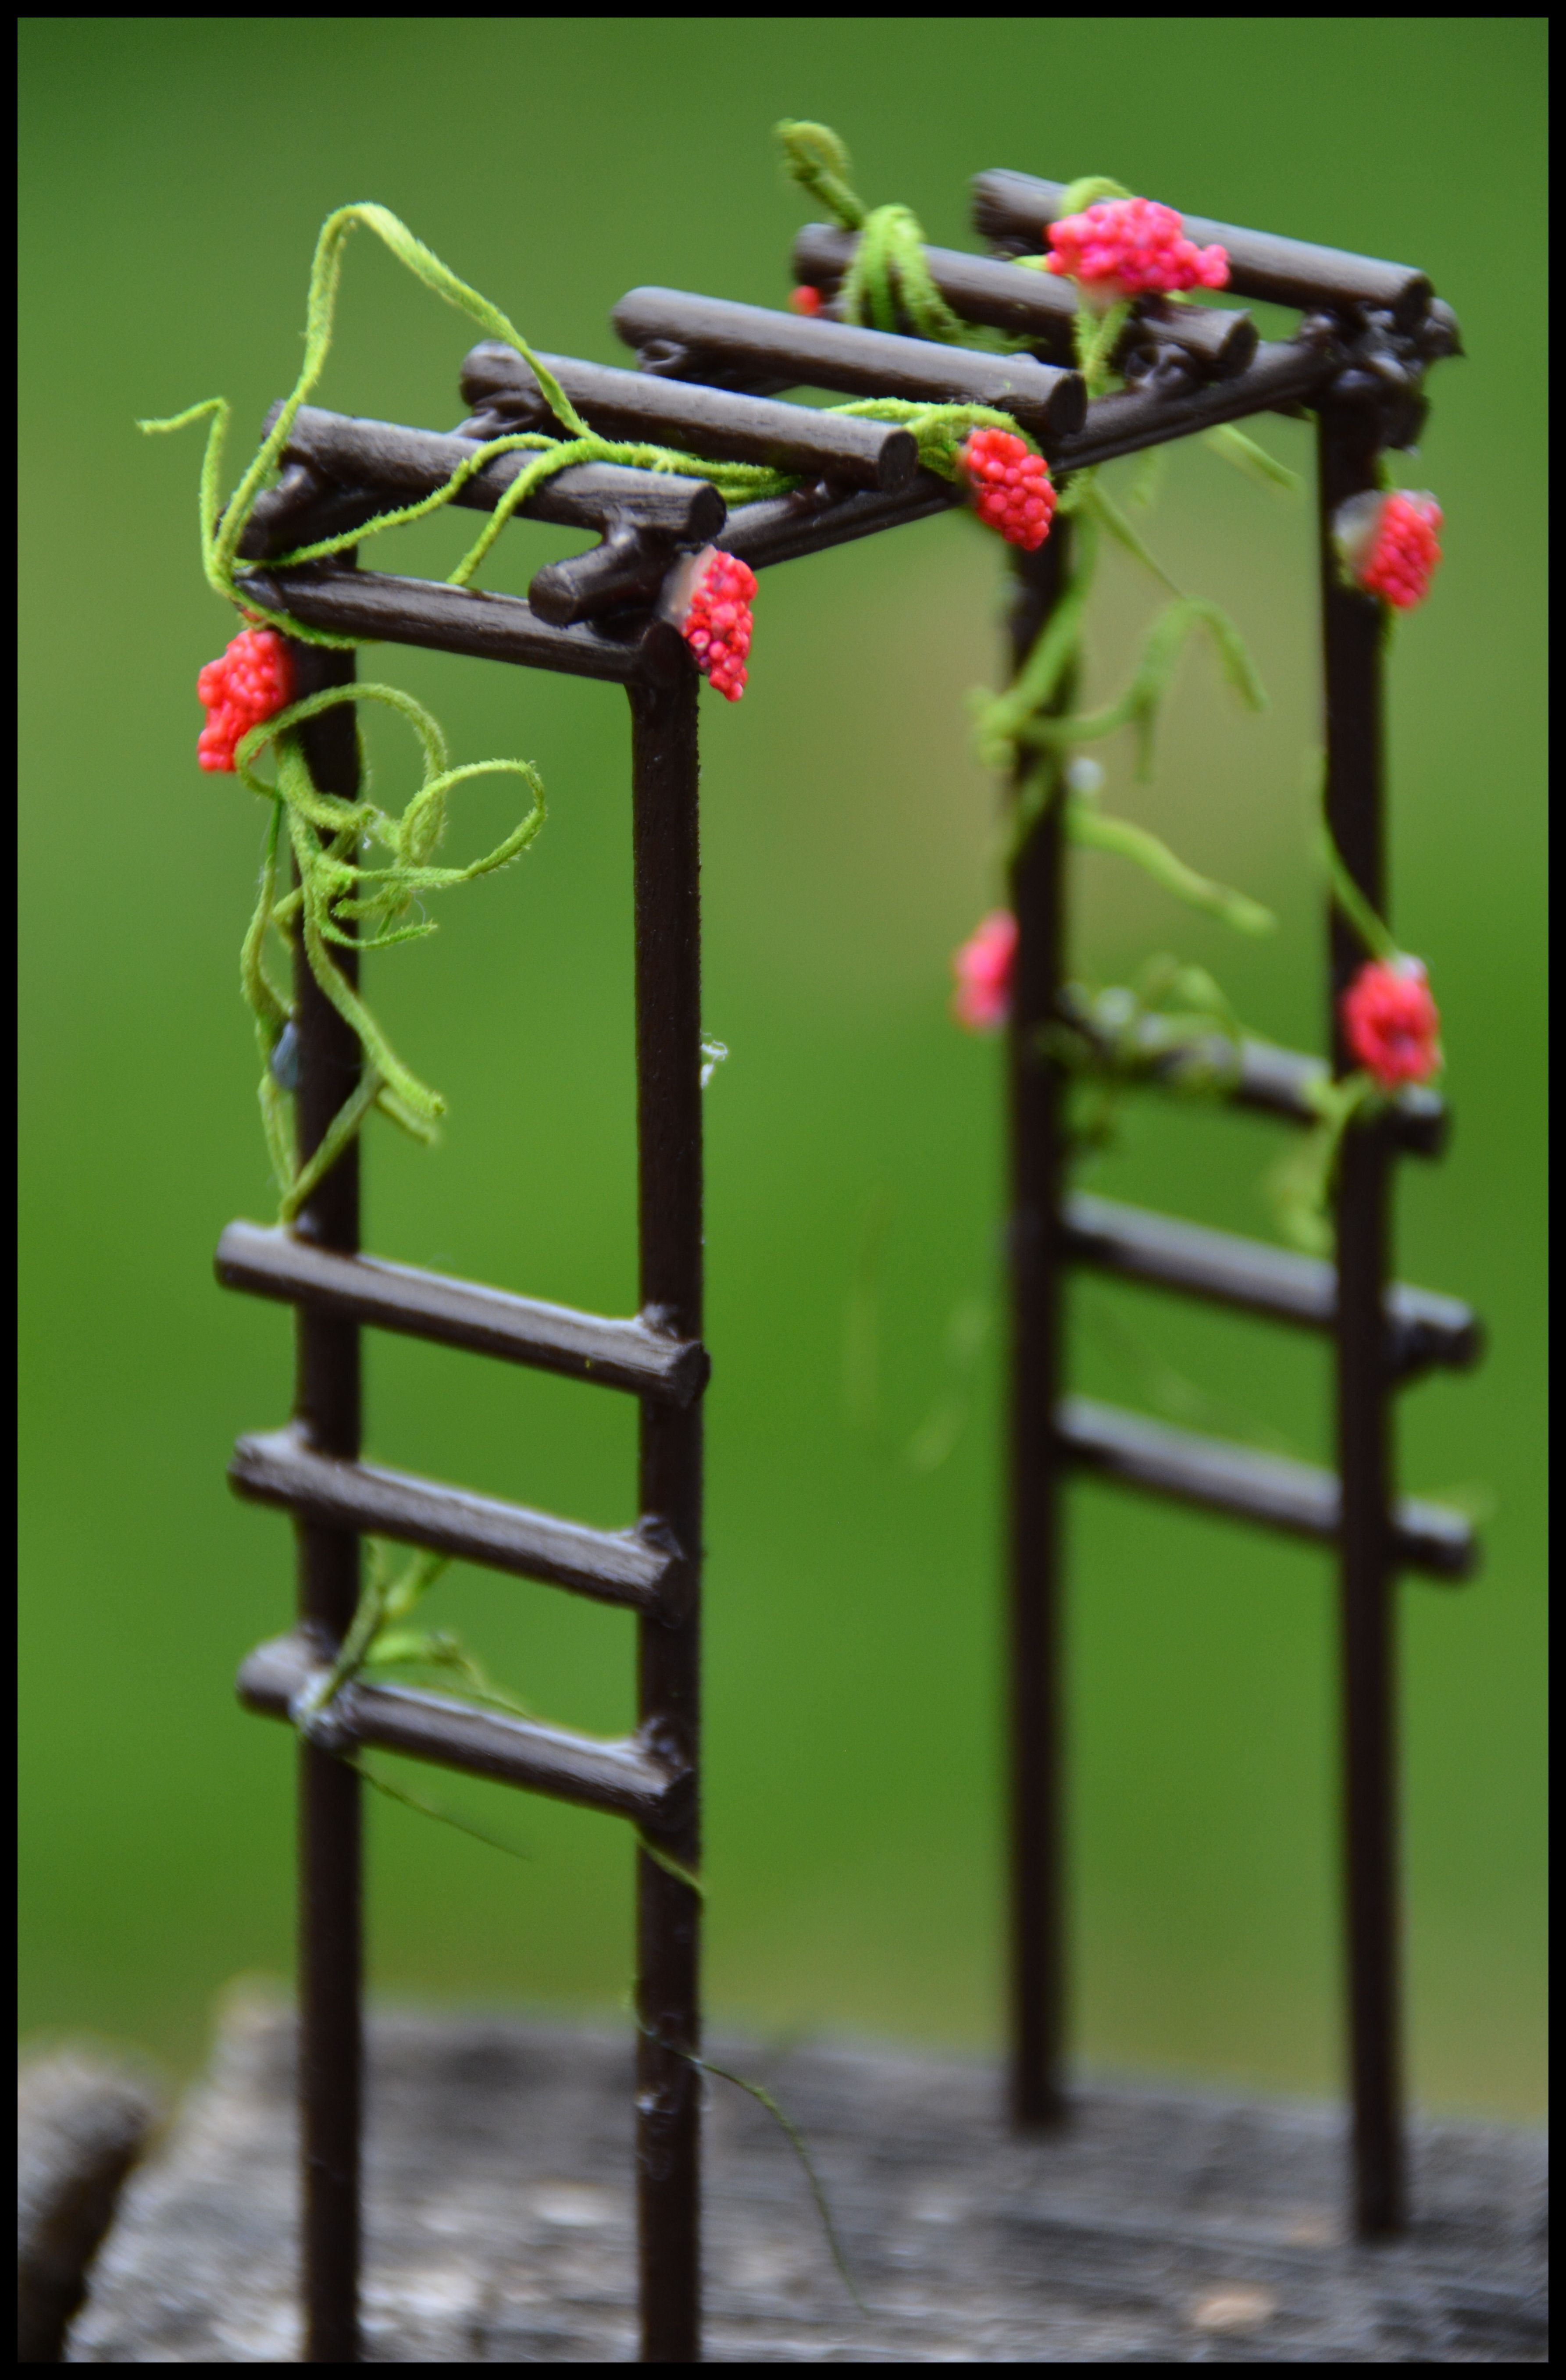 Miniature Faery Garden Trellis I Created From Wood Sticks 400 x 300